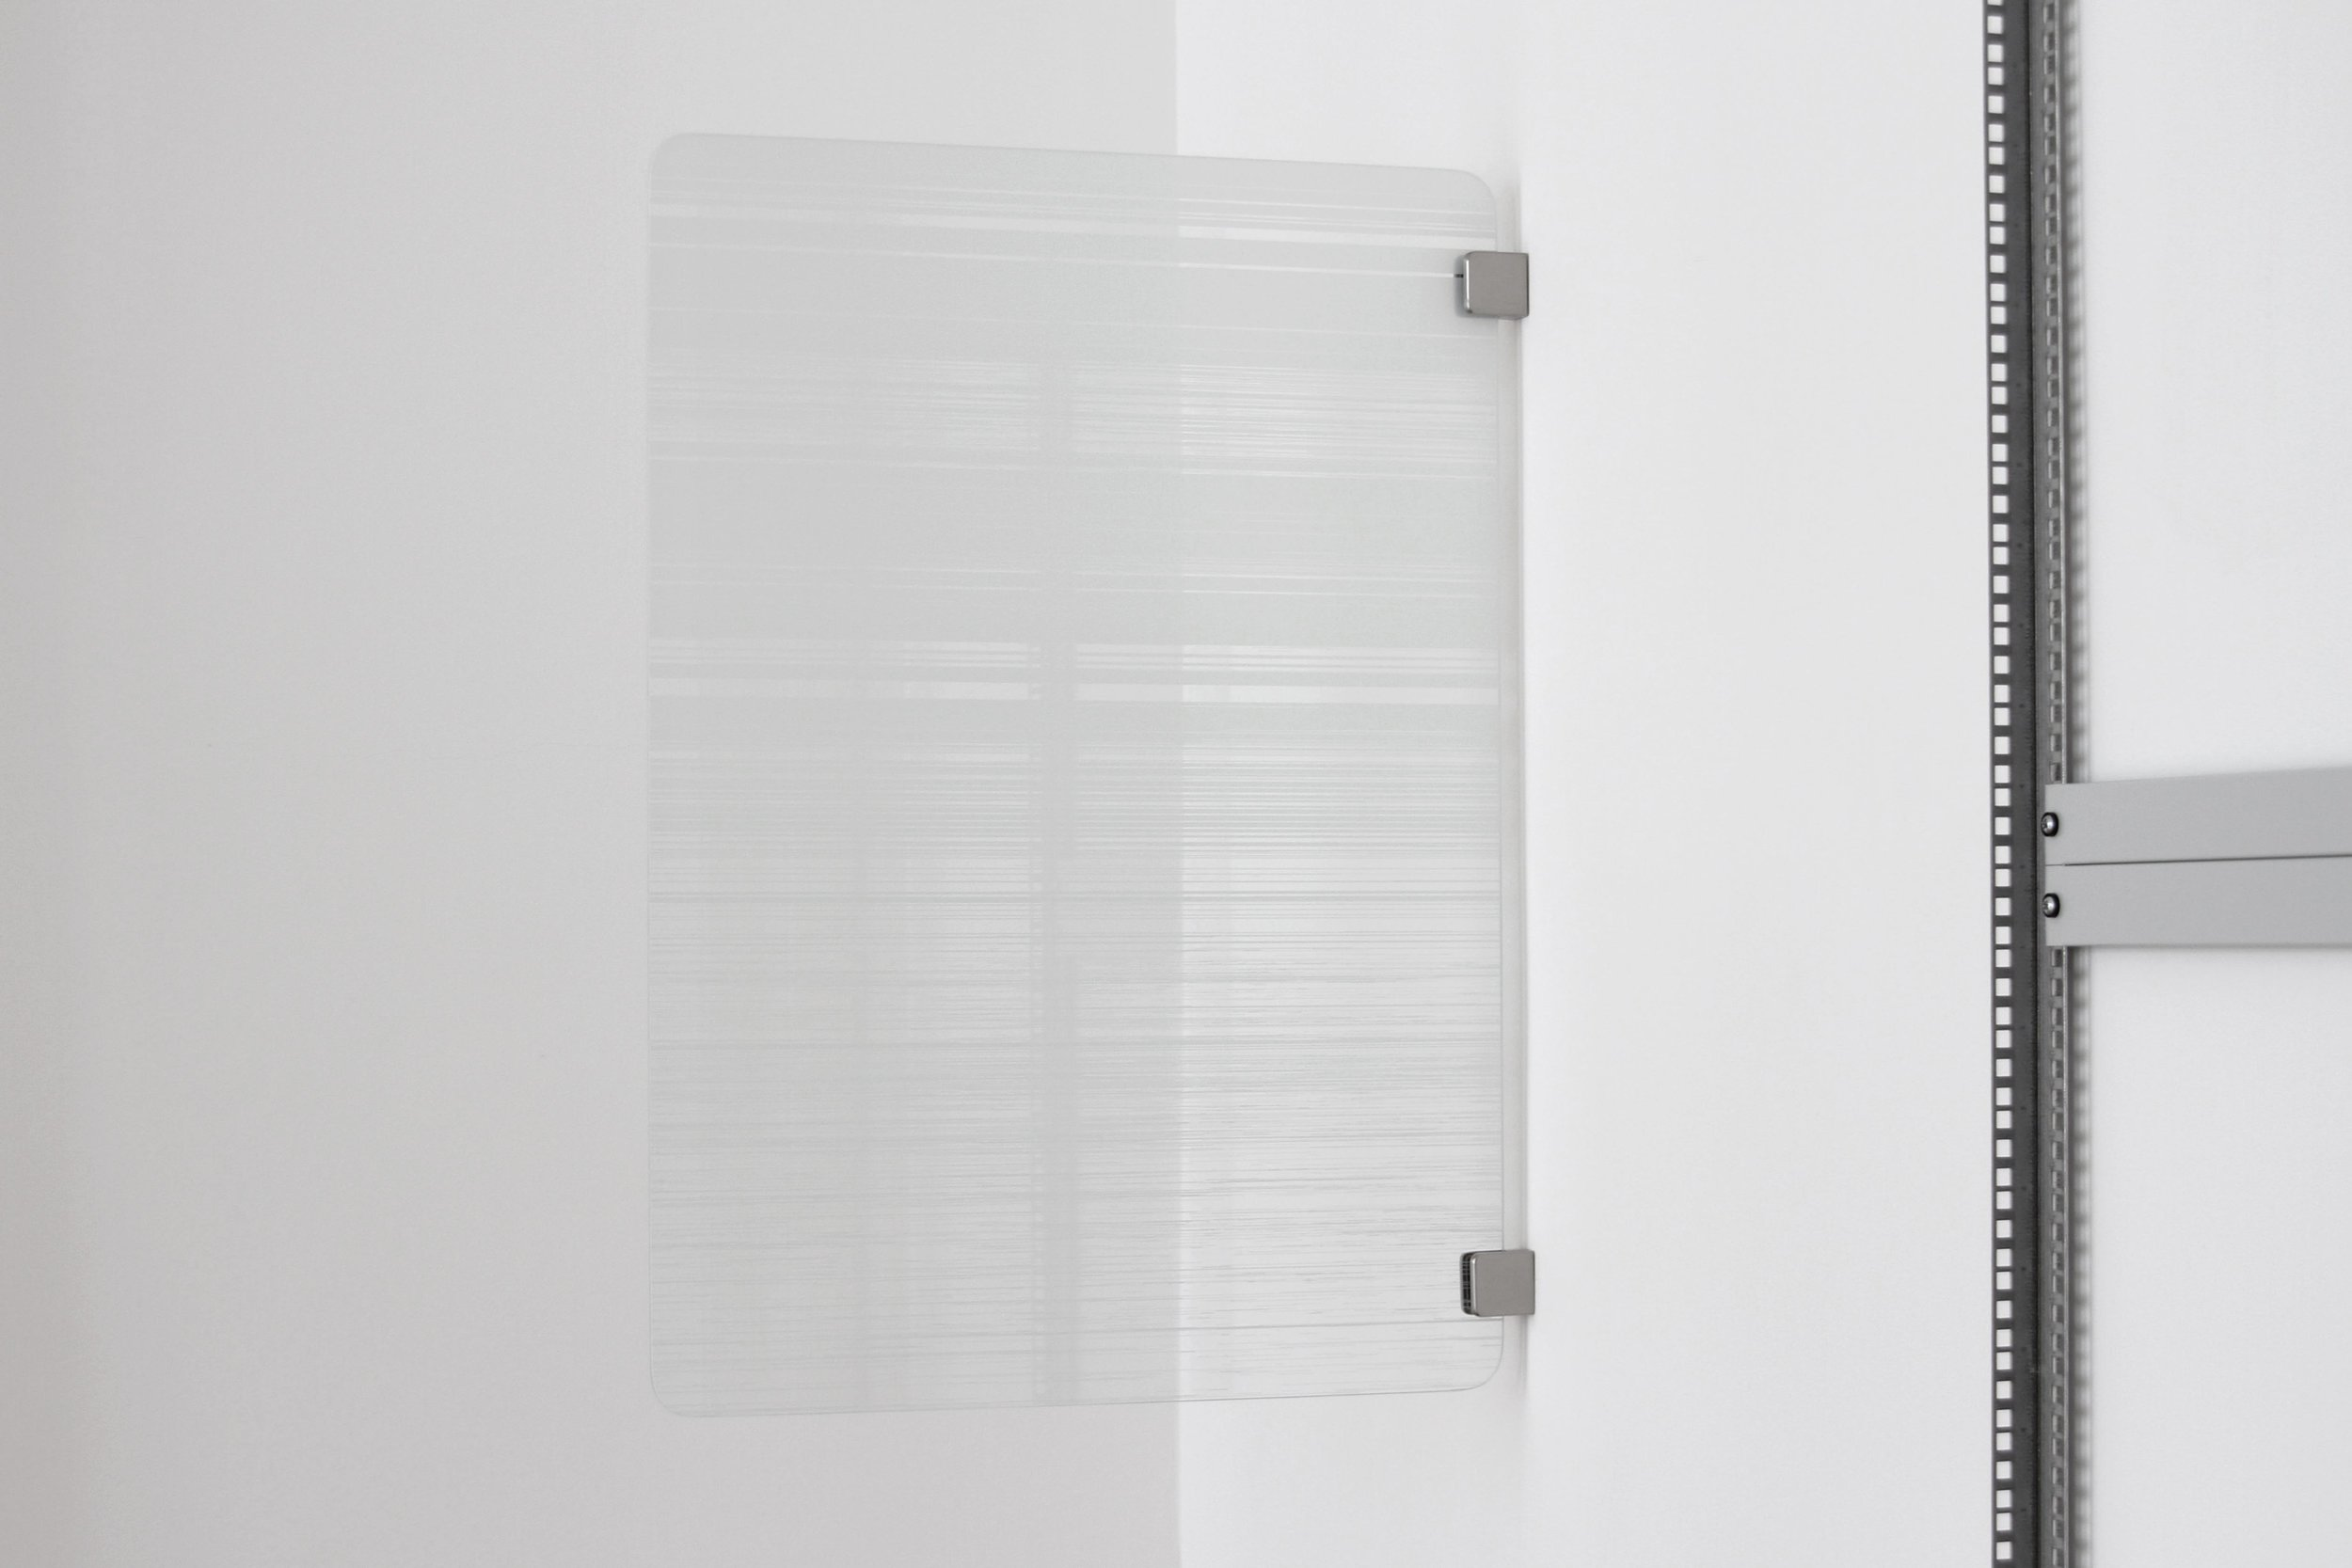 Julian Palacz, Fragmentierung Variation 2, 2017, UV-print on float glass 85 x 60 cm, 1 + 1AP